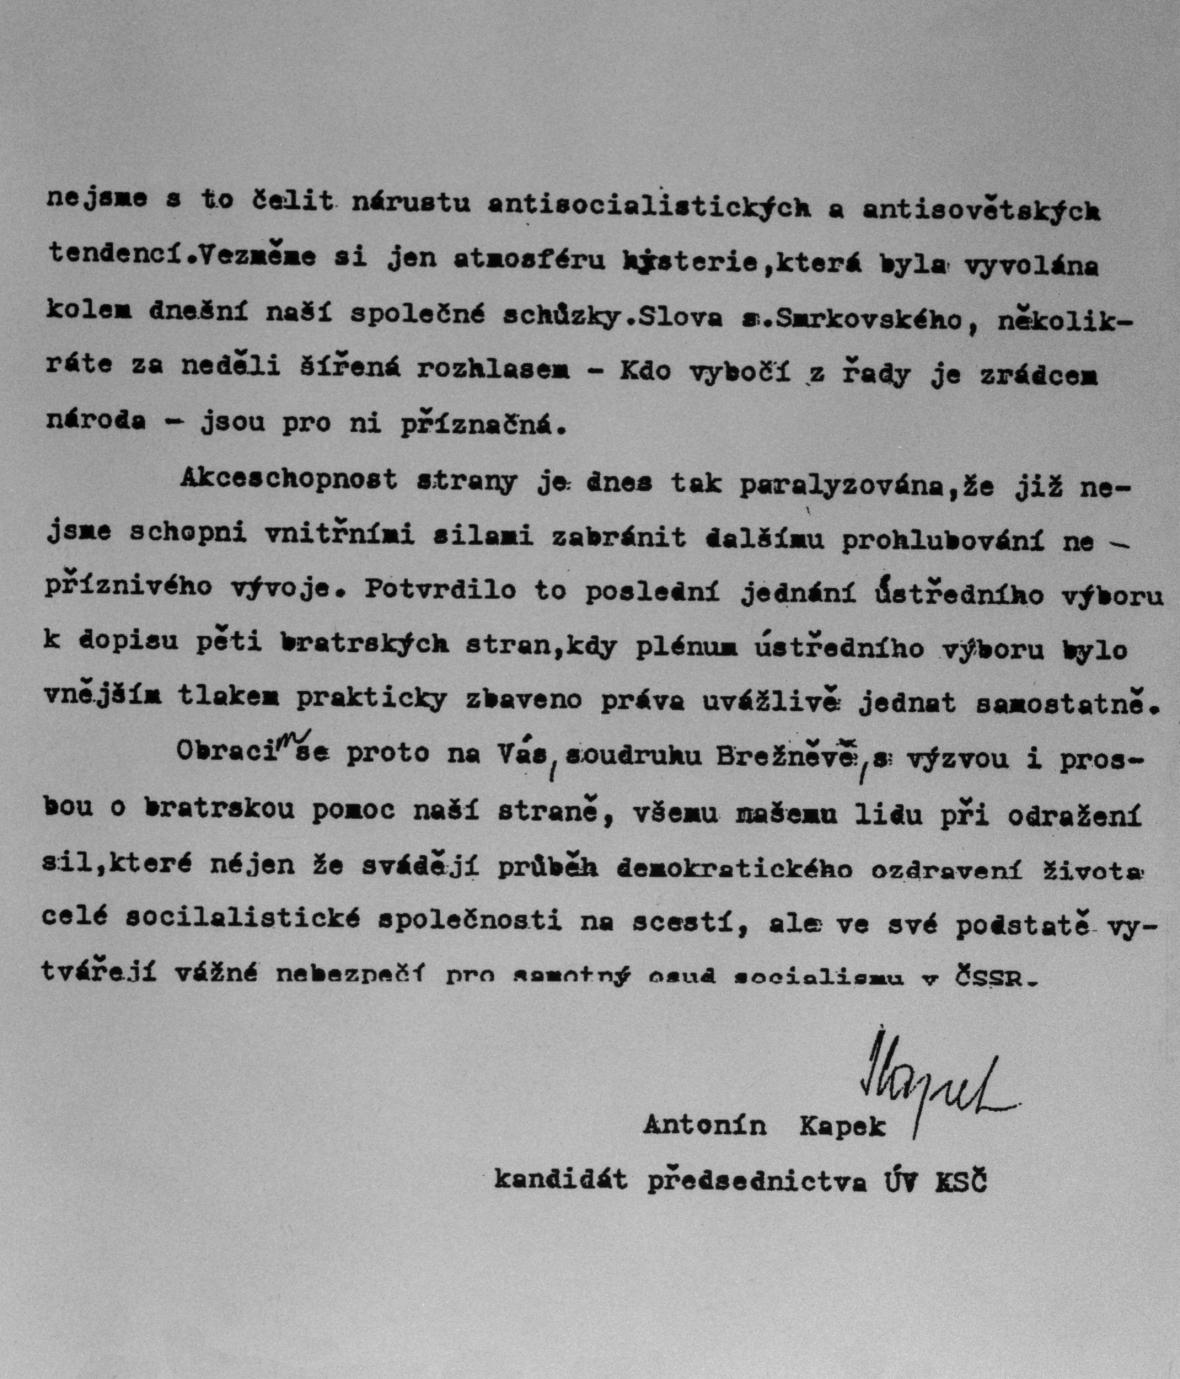 Kopie zvacího dopisu Antonína Kapka